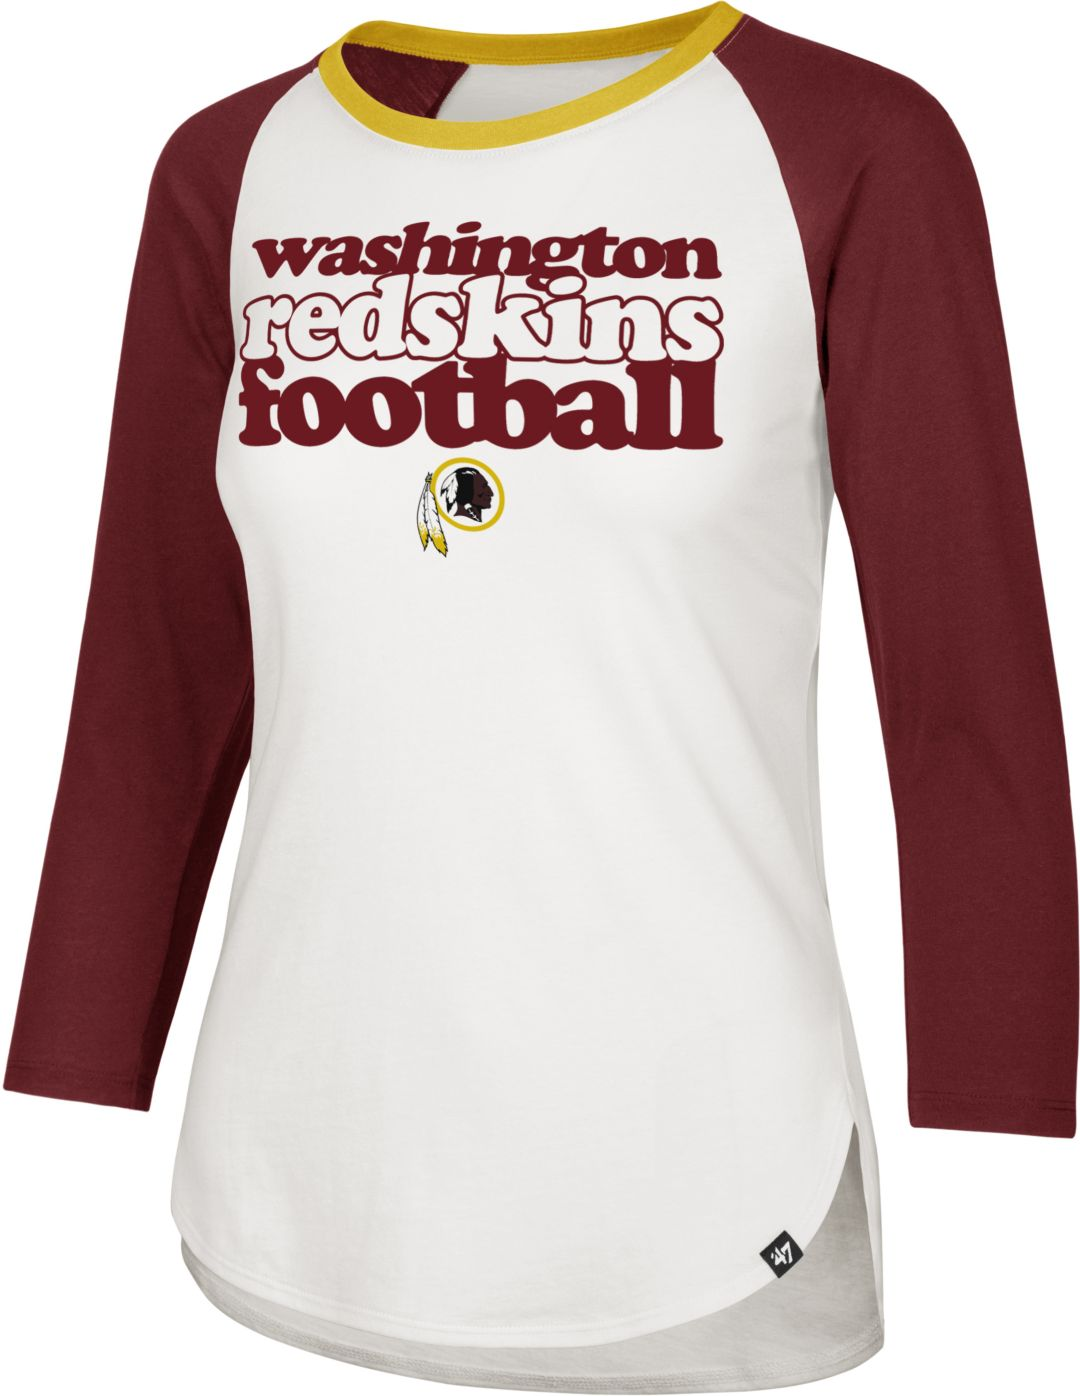 finest selection caf40 fd181 '47 Women's Washington Redskins Retro Stock Throwback Raglan Shirt